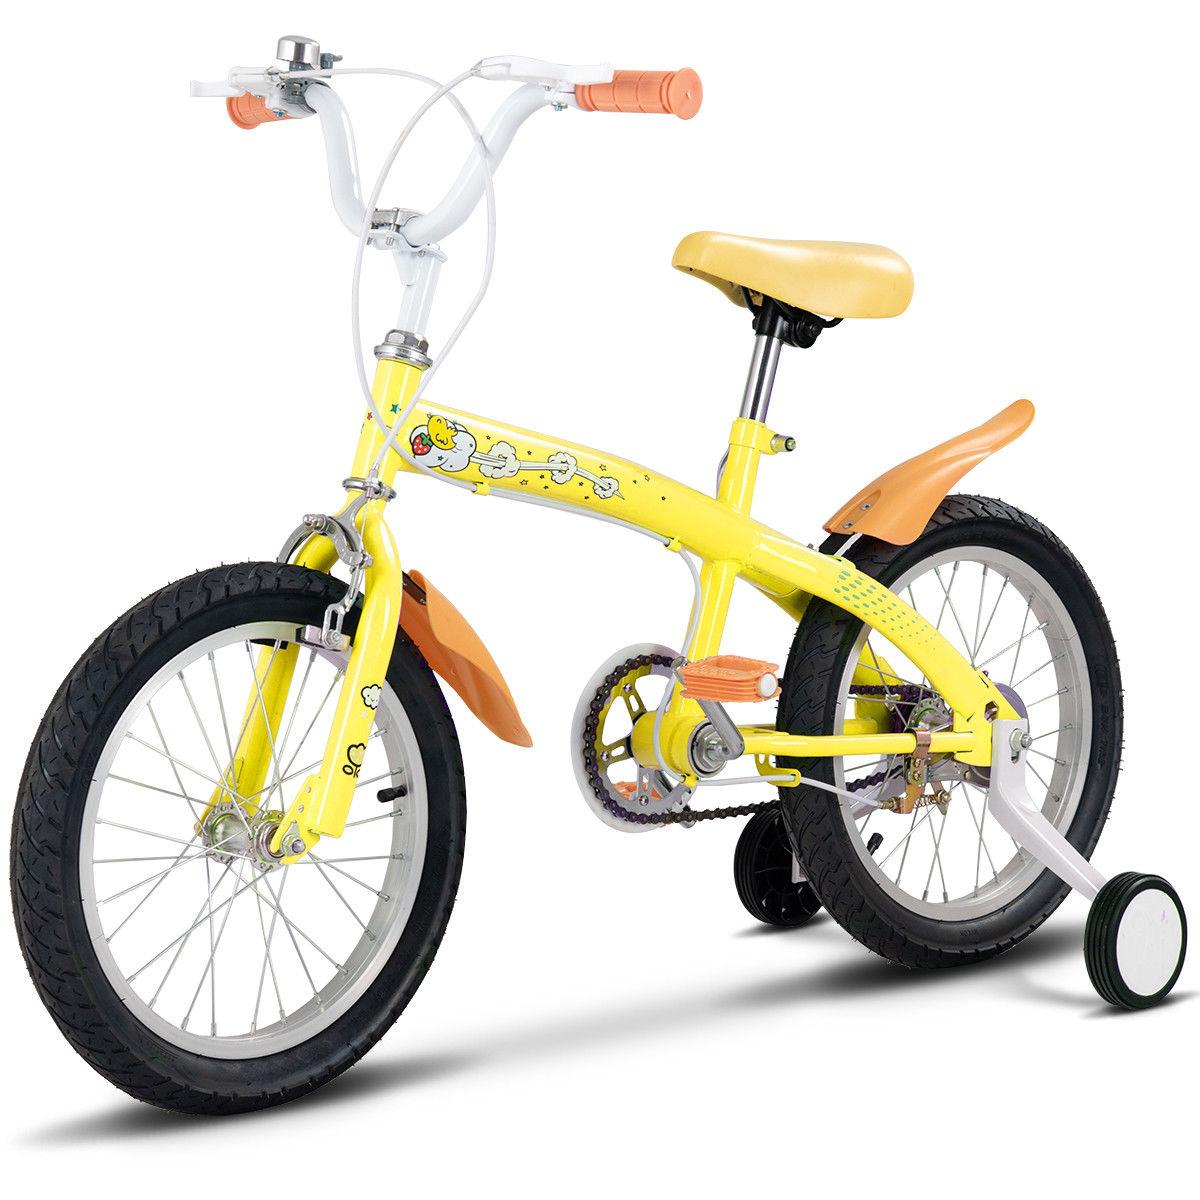 Goplus 16'' Kids Bicycle Bike Outdoor Sports With Training Wheels Bell Boys Girls Yellow